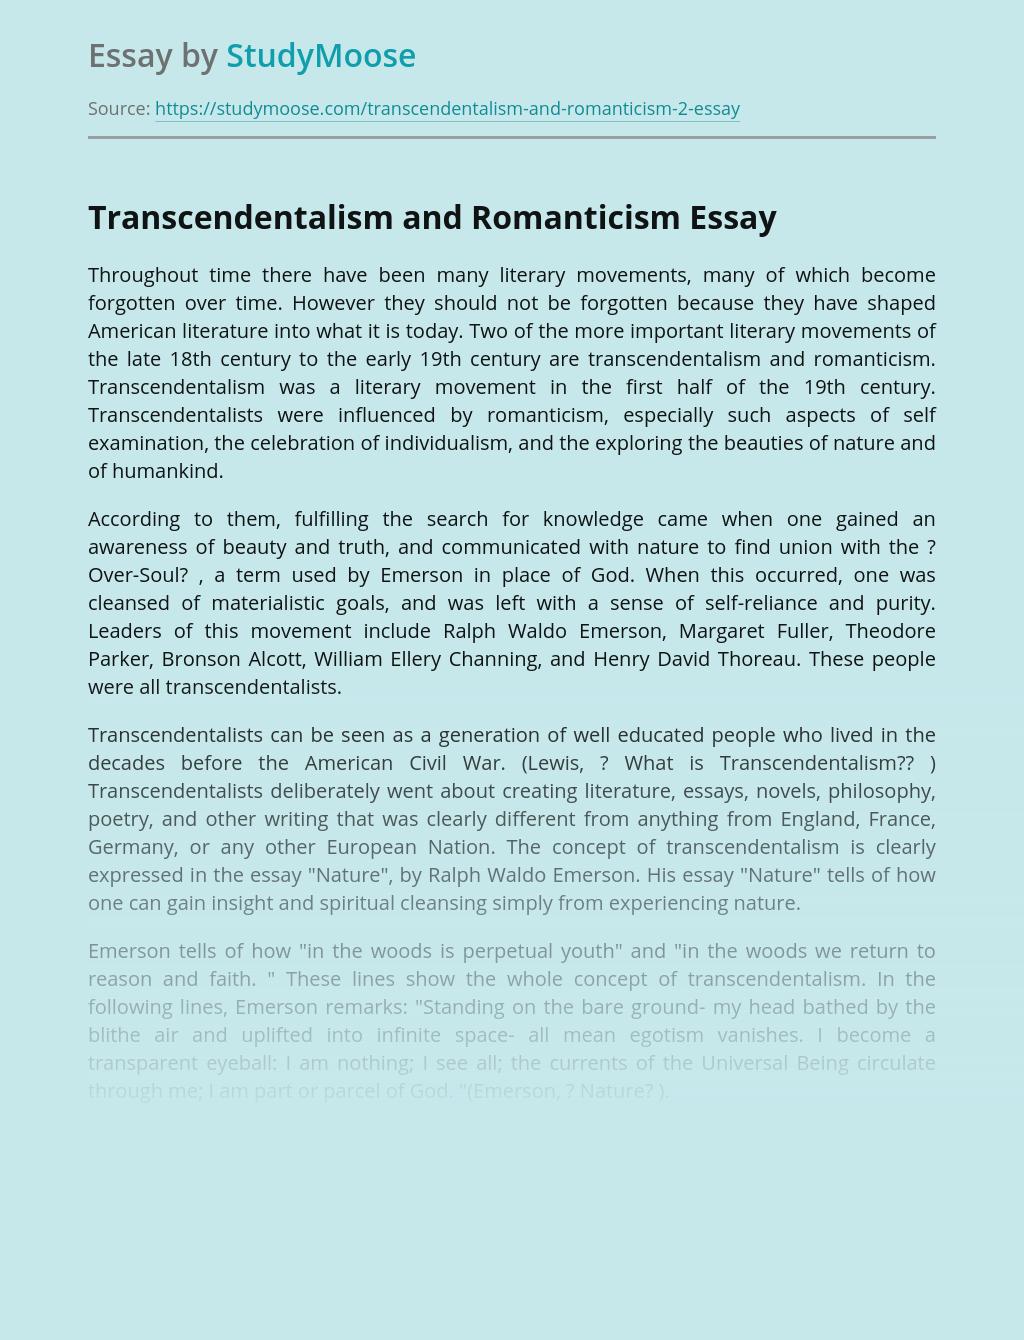 Transcendentalism and Romanticism